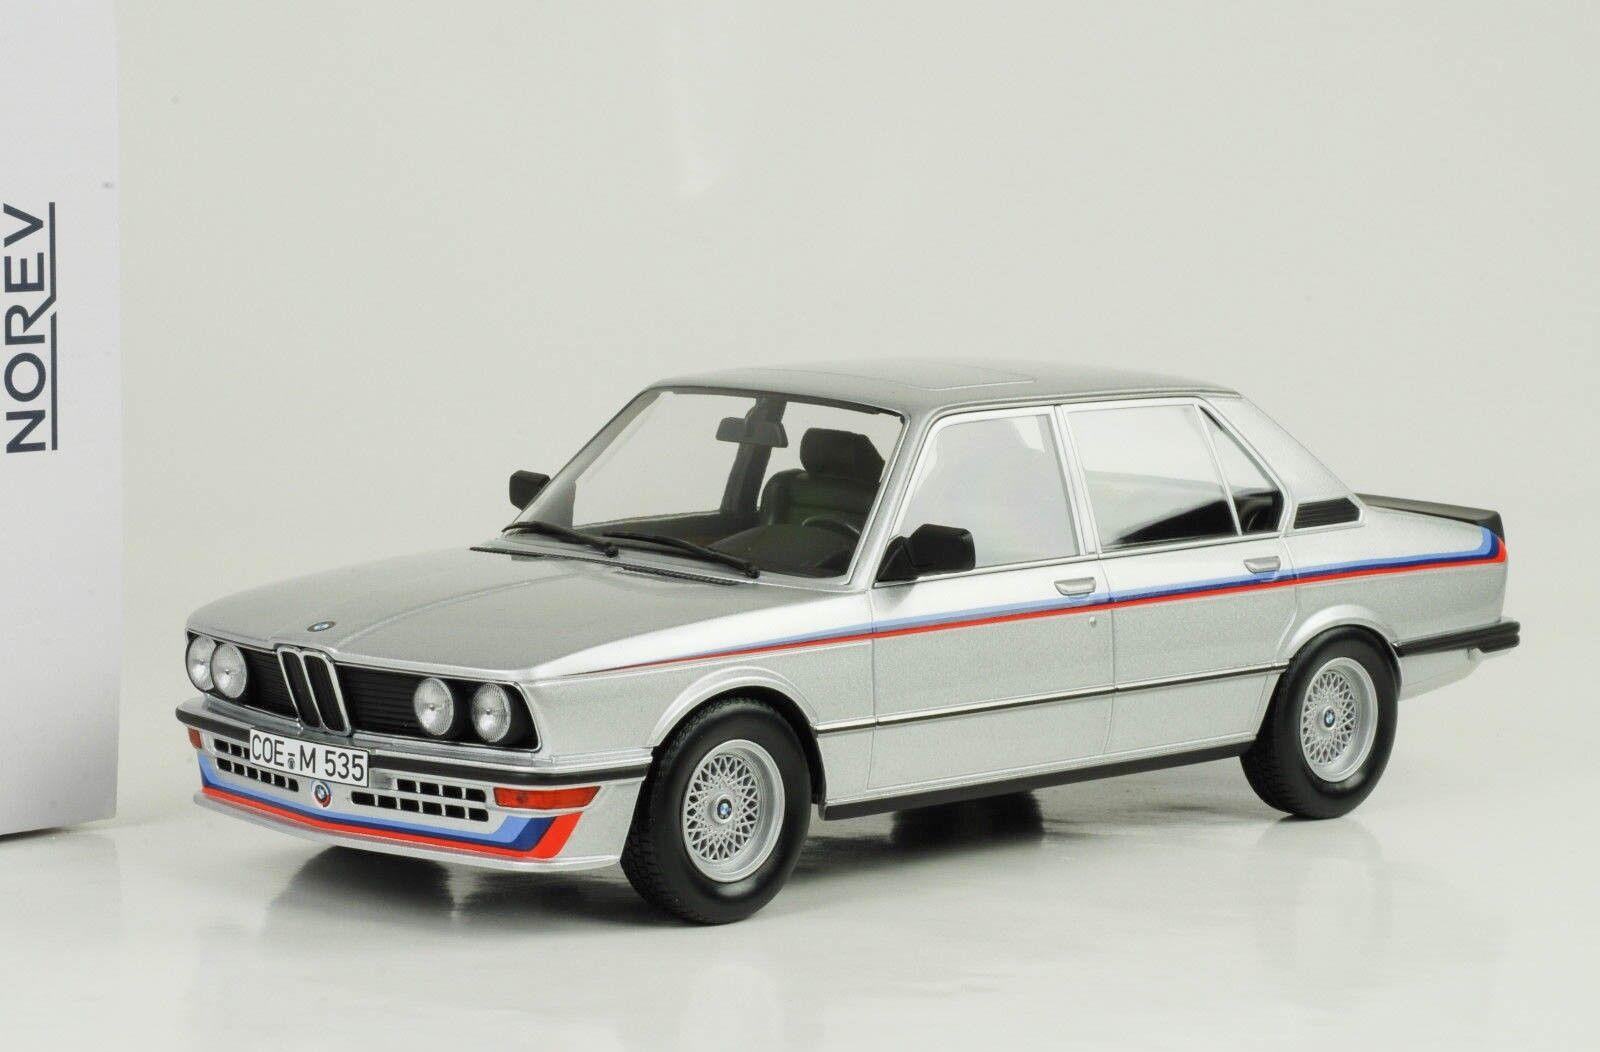 1980 BMW 535i m535i e12 argent métallique 1 18 Norev 183266